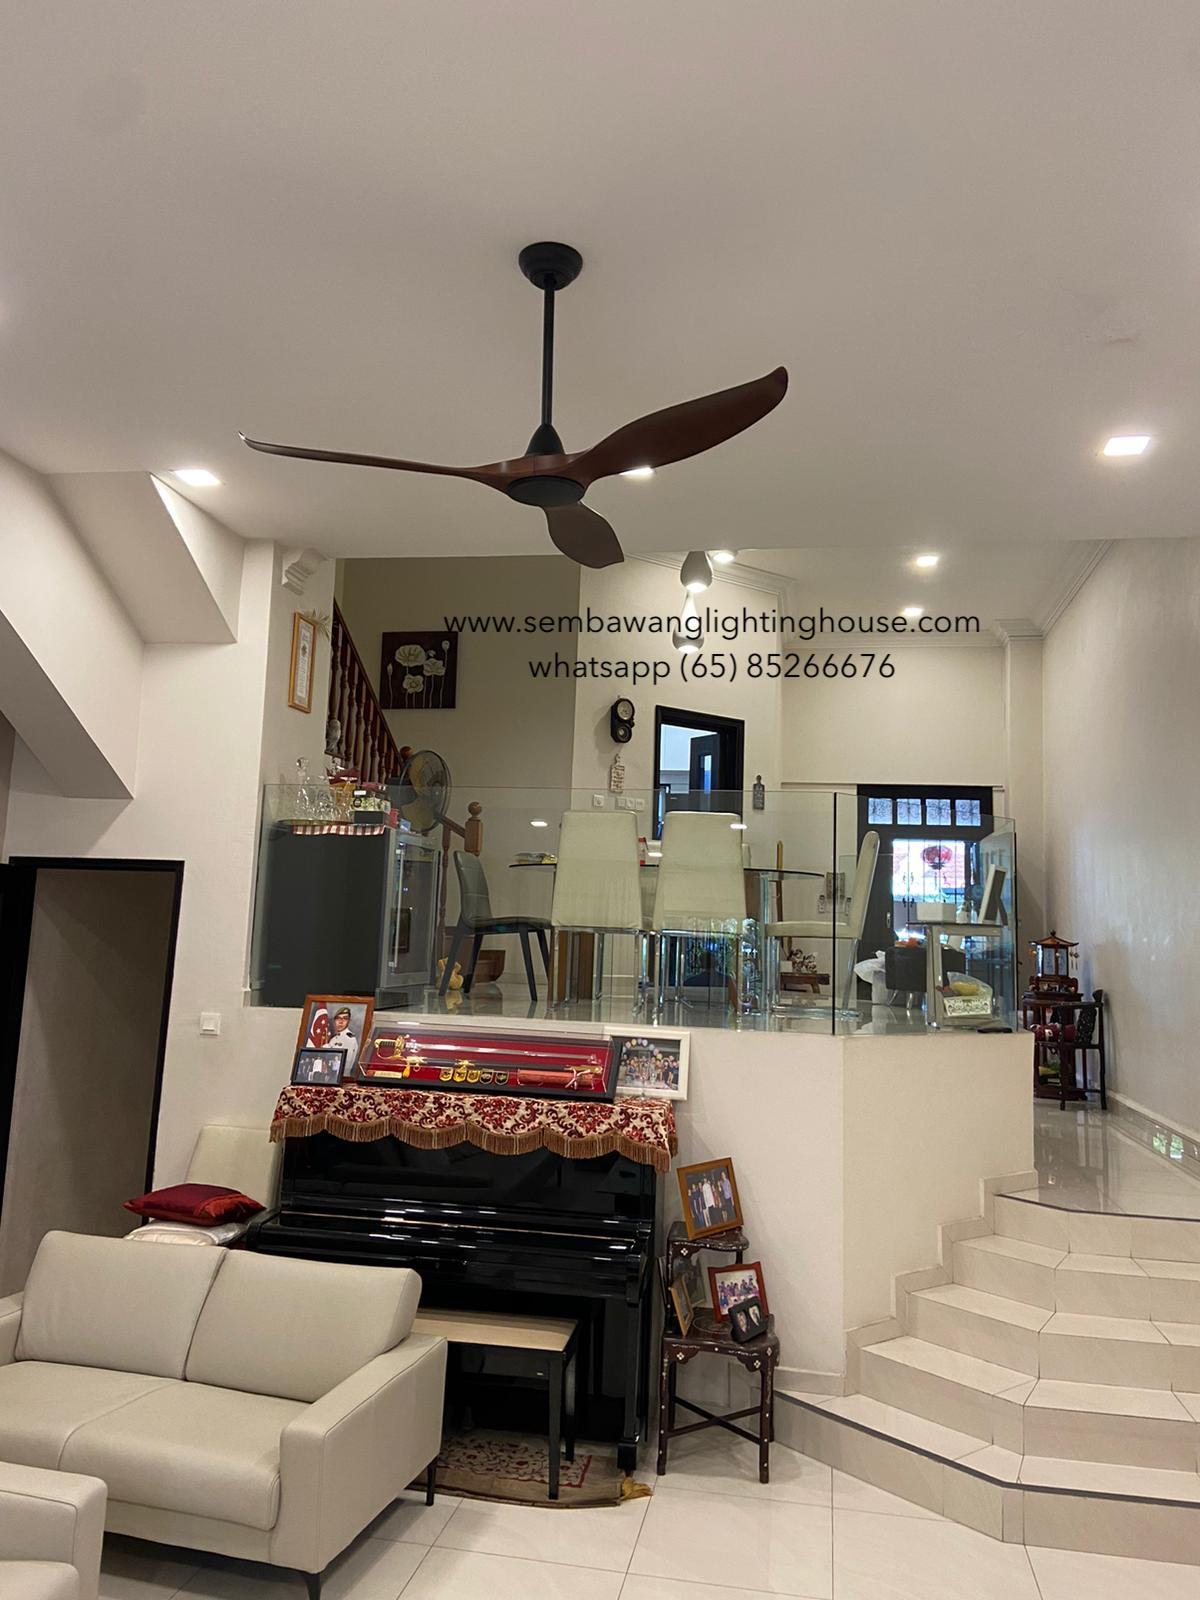 efenz-downrod-ceiling-fan-without-light-black-dutch-cocoa-21.jpeg